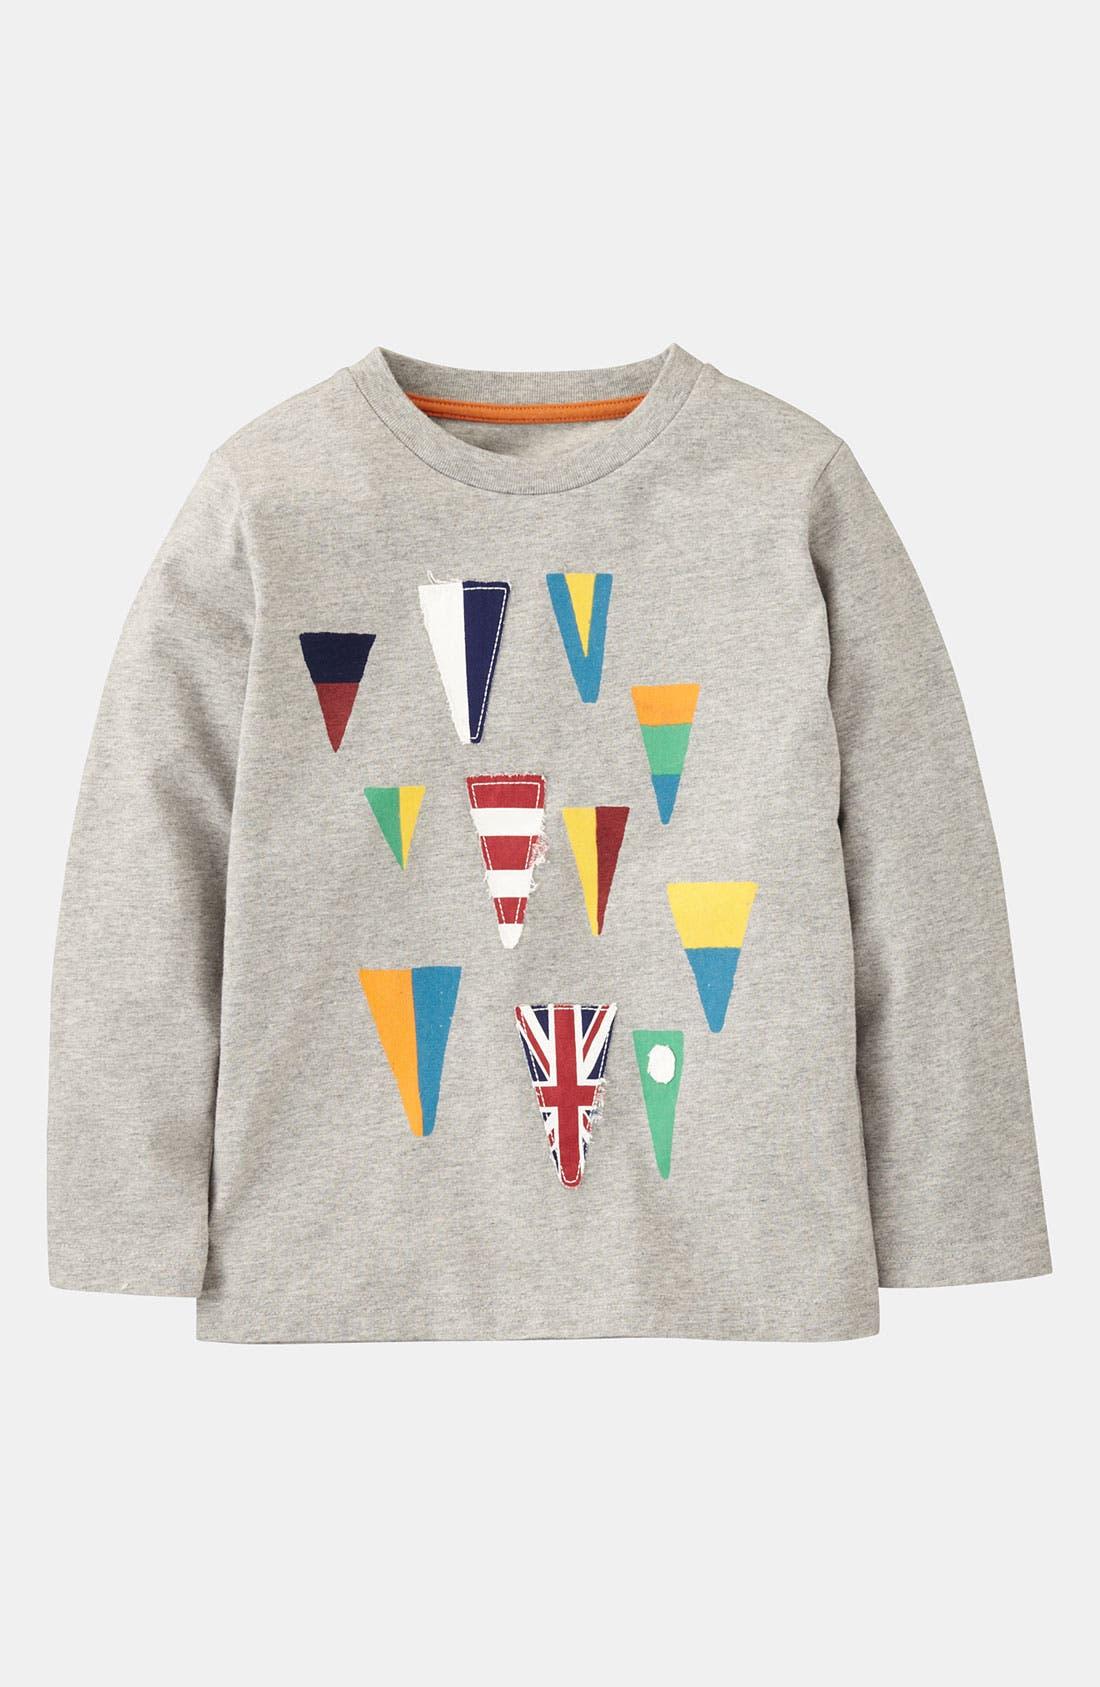 Main Image - Mini Boden 'Harbor' T-Shirt (Toddler)